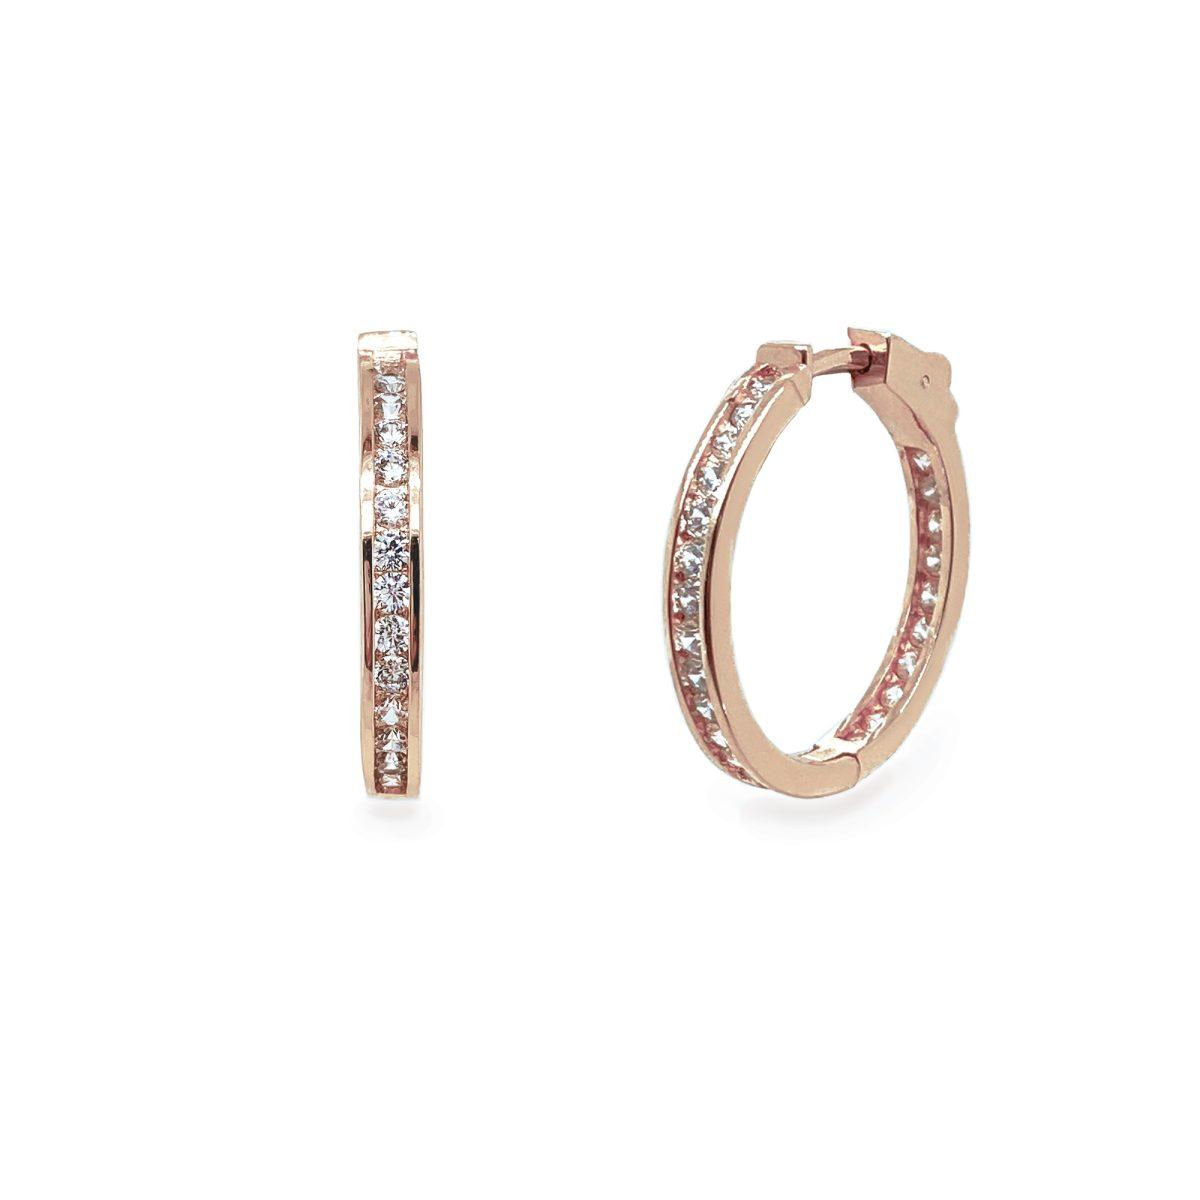 Ivory and Co Copenhagen Rose Hoop Earrings 1